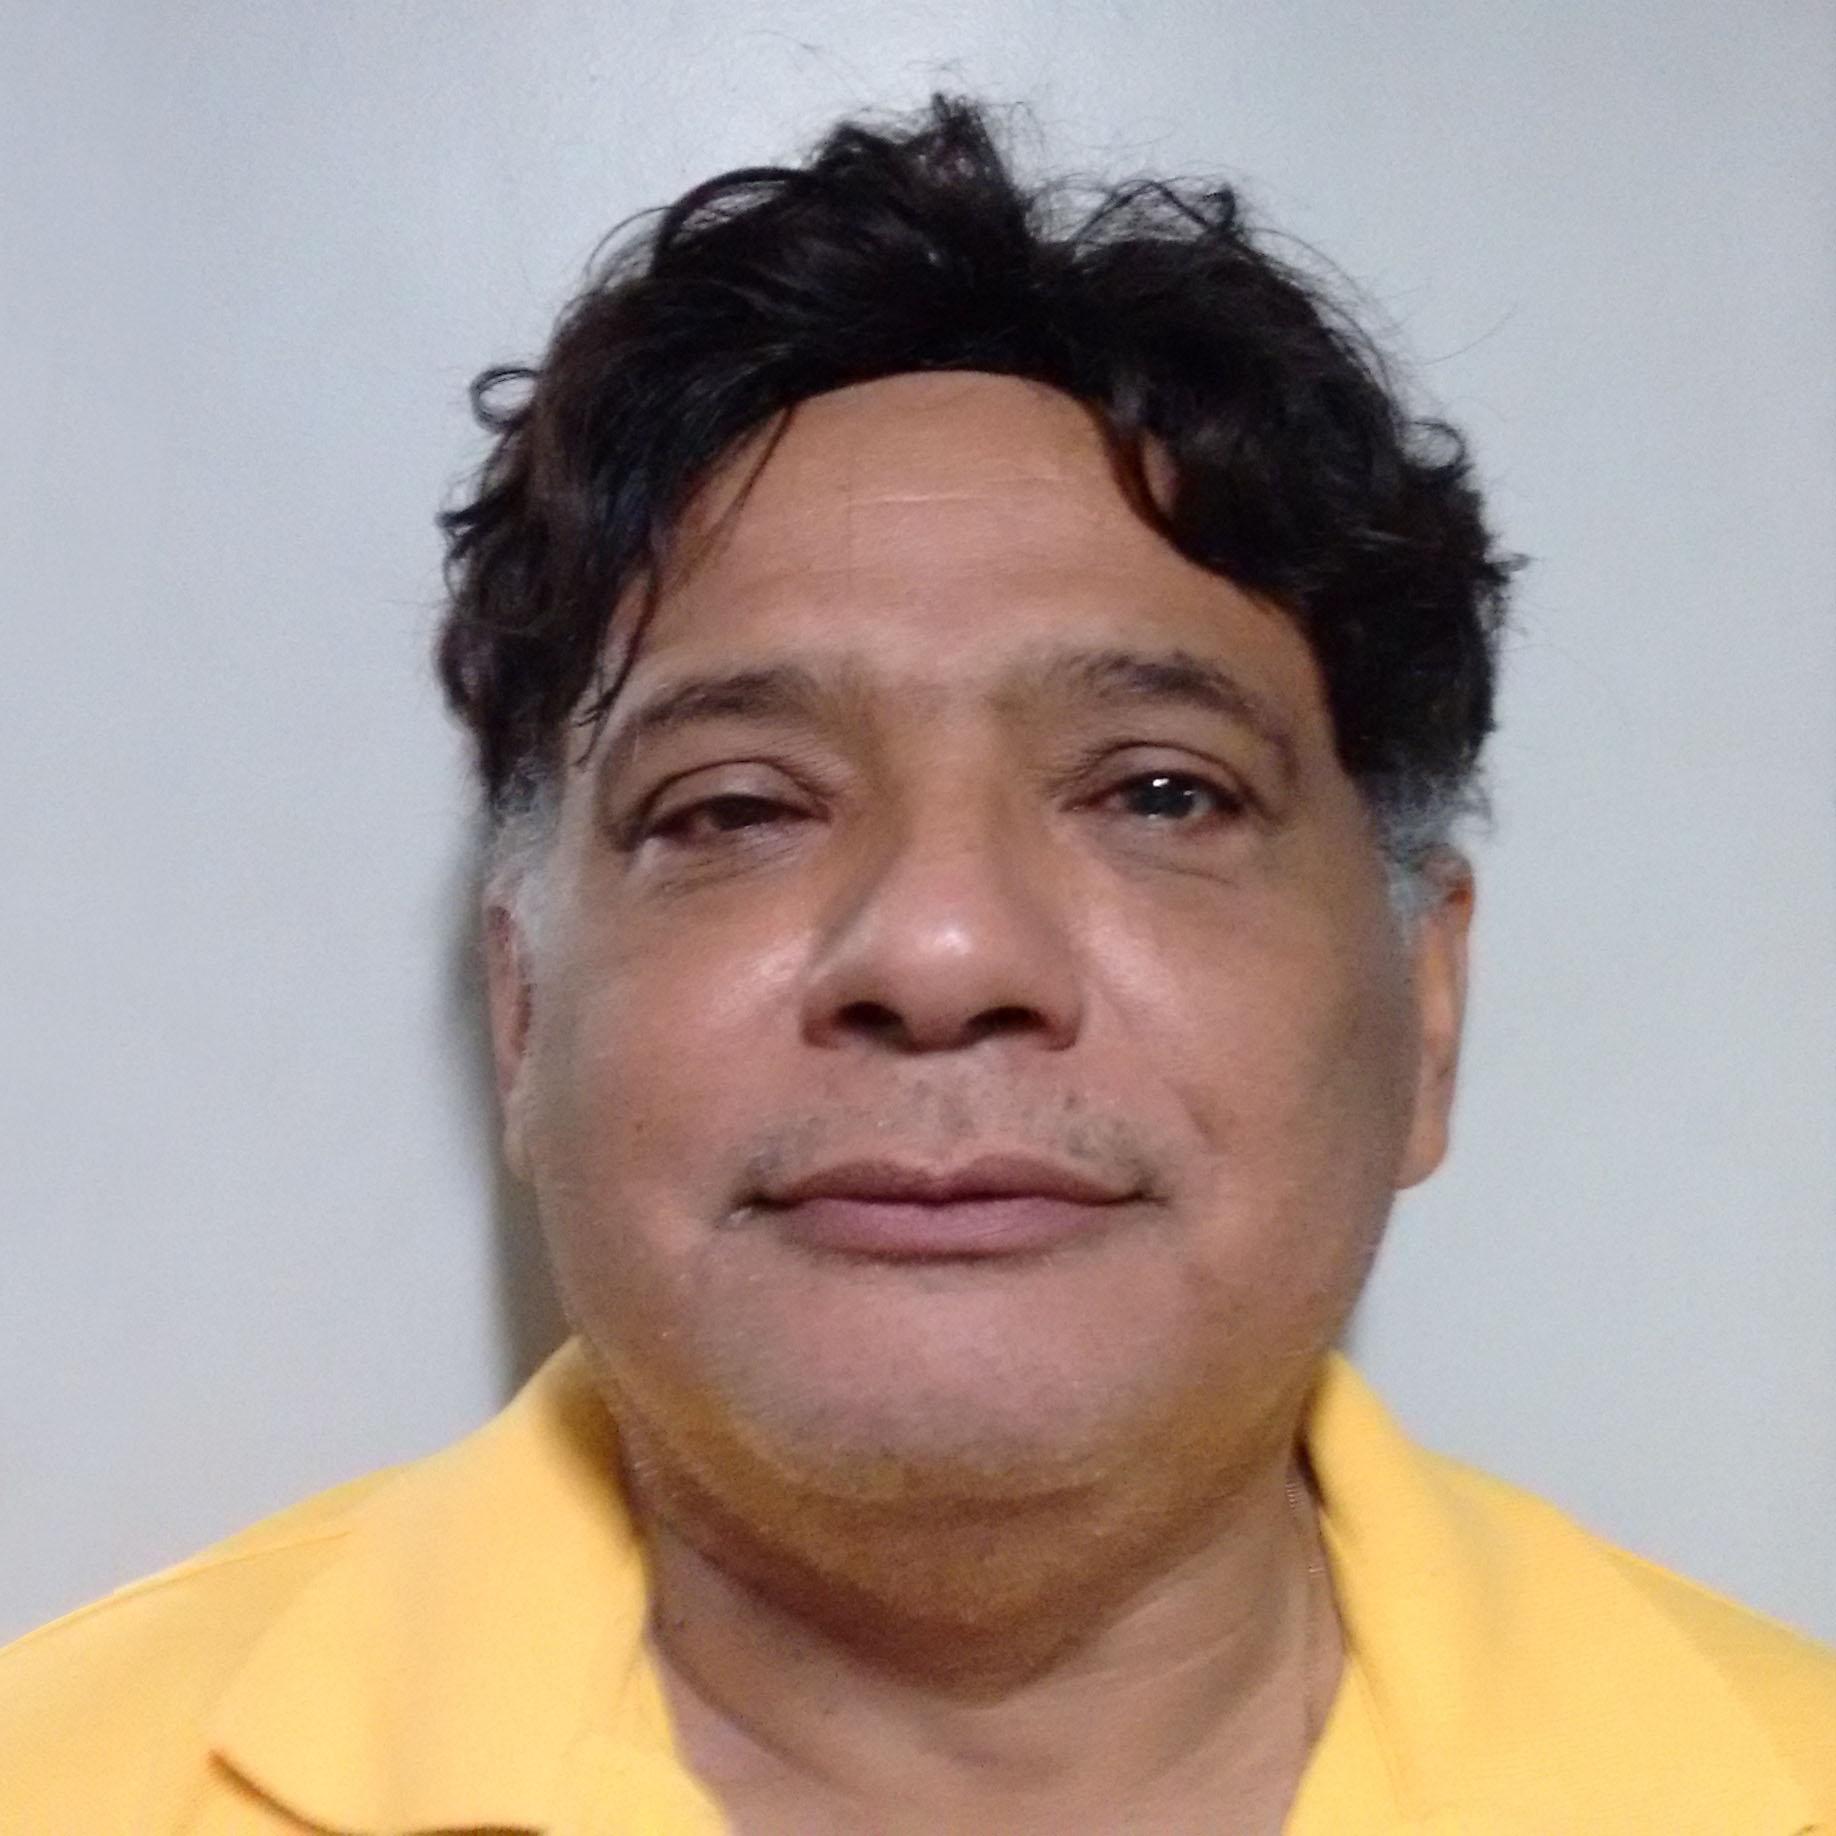 Vicente de Paula da Silva